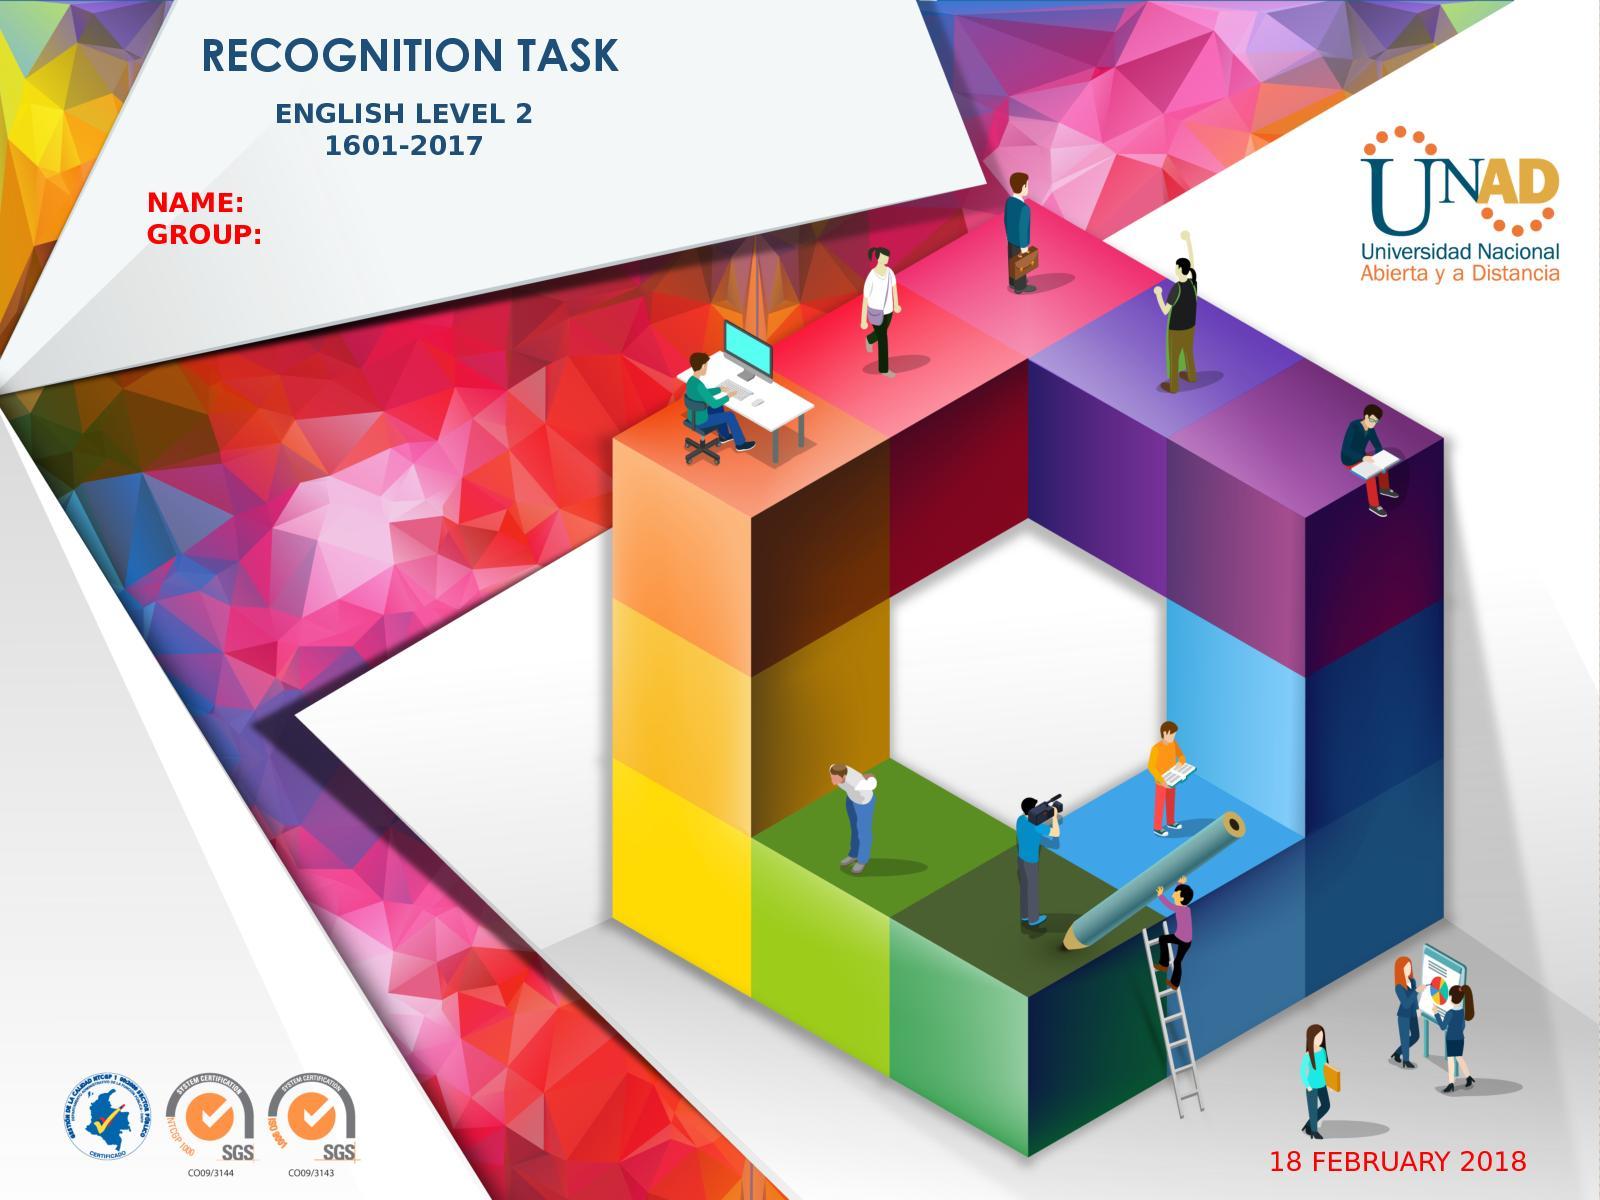 English Level 2 Recognition Task Portfolio Template